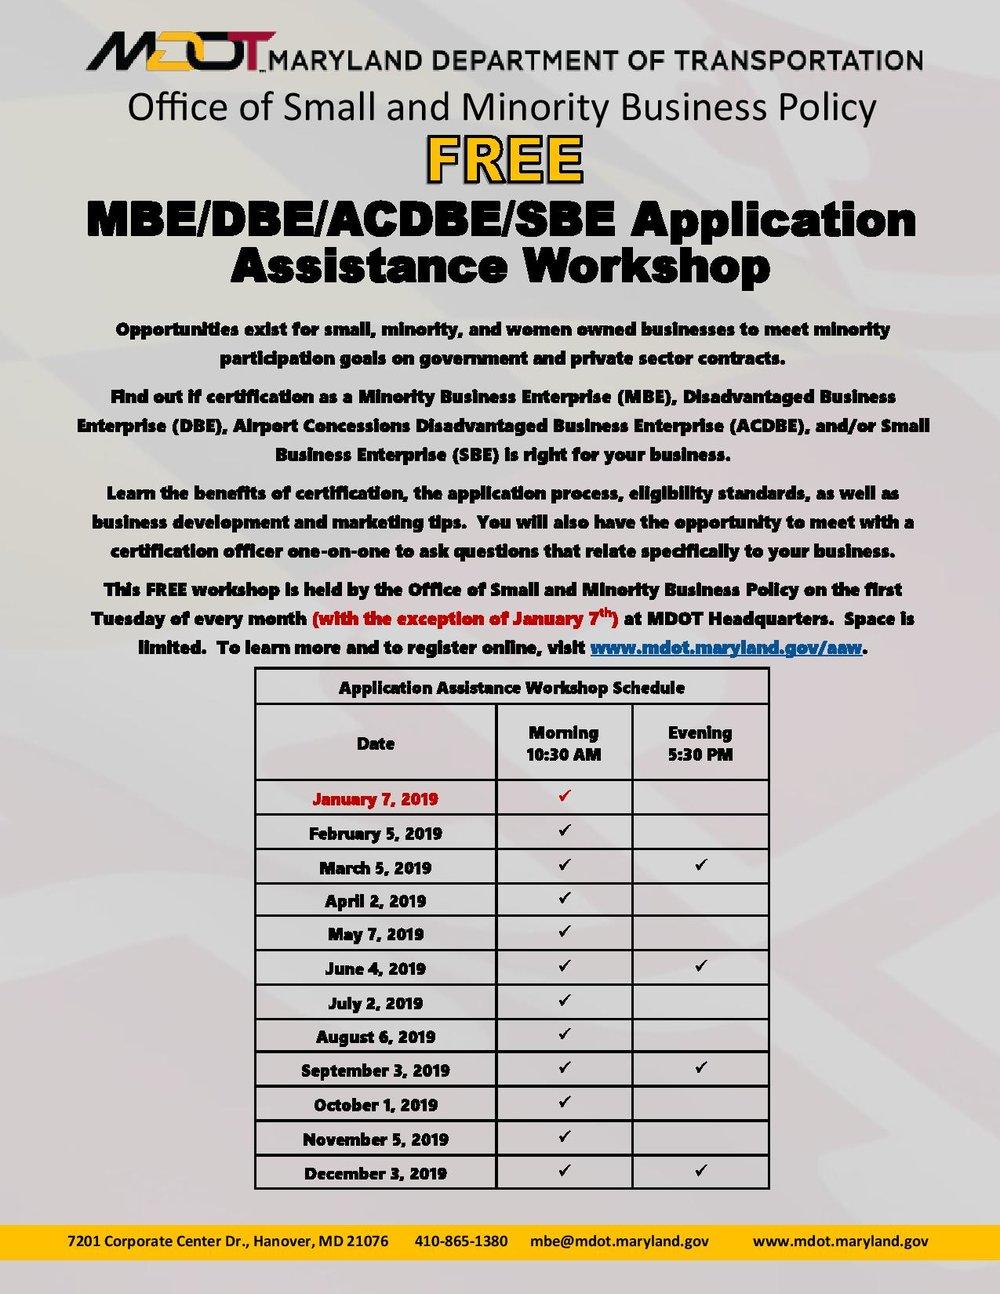 2019 MDOT Certification Workshop Schedule Flier-page-001.jpg